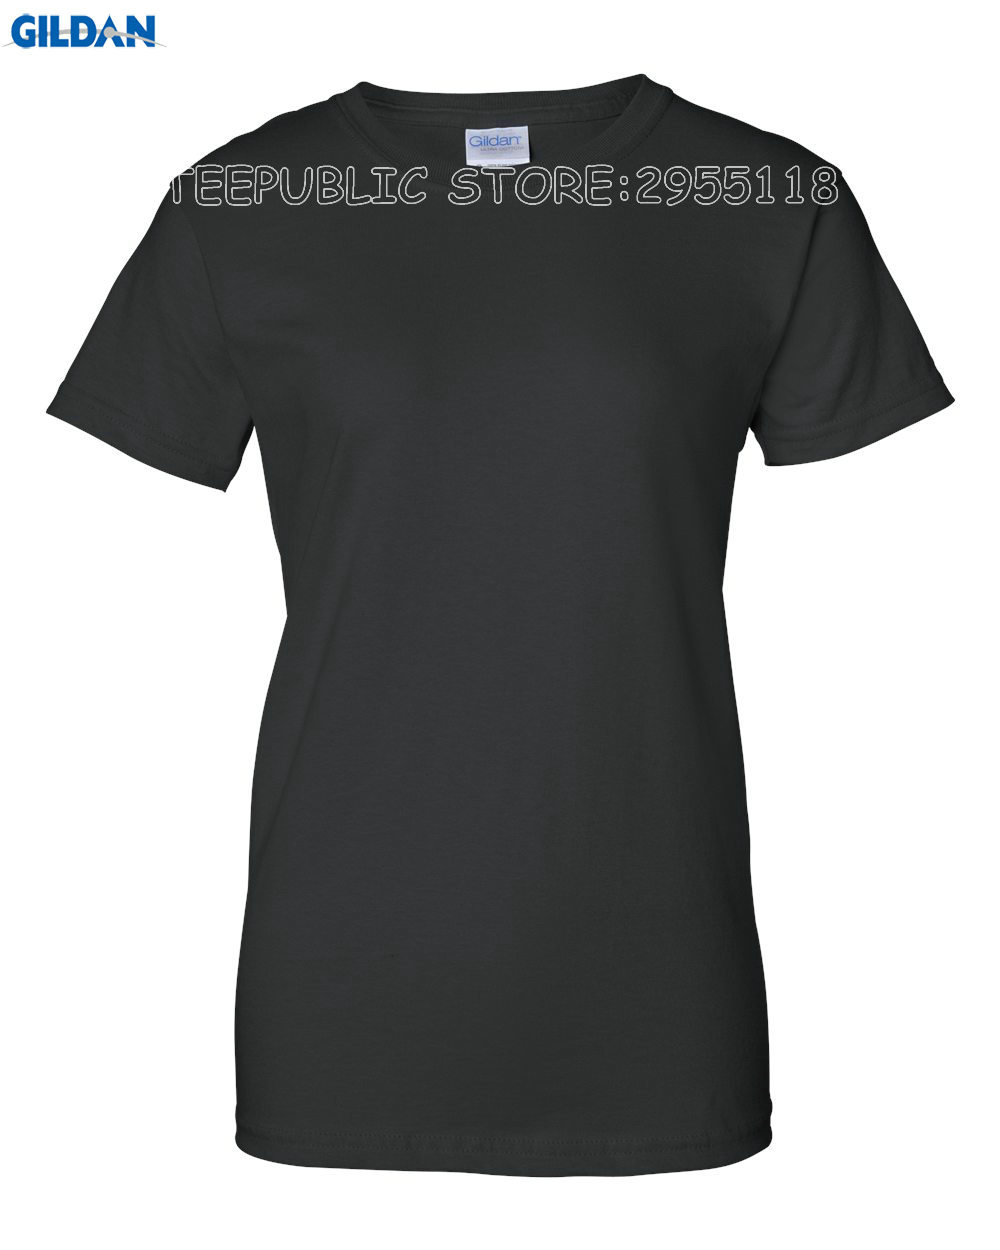 Design t shirt gildan - Aliexpress Com Buy Gildan Design T Shirt Crew Neck Queens Are Born In October Women Short Design T Shirts From Reliable T Shirt Suppliers On Teepublic